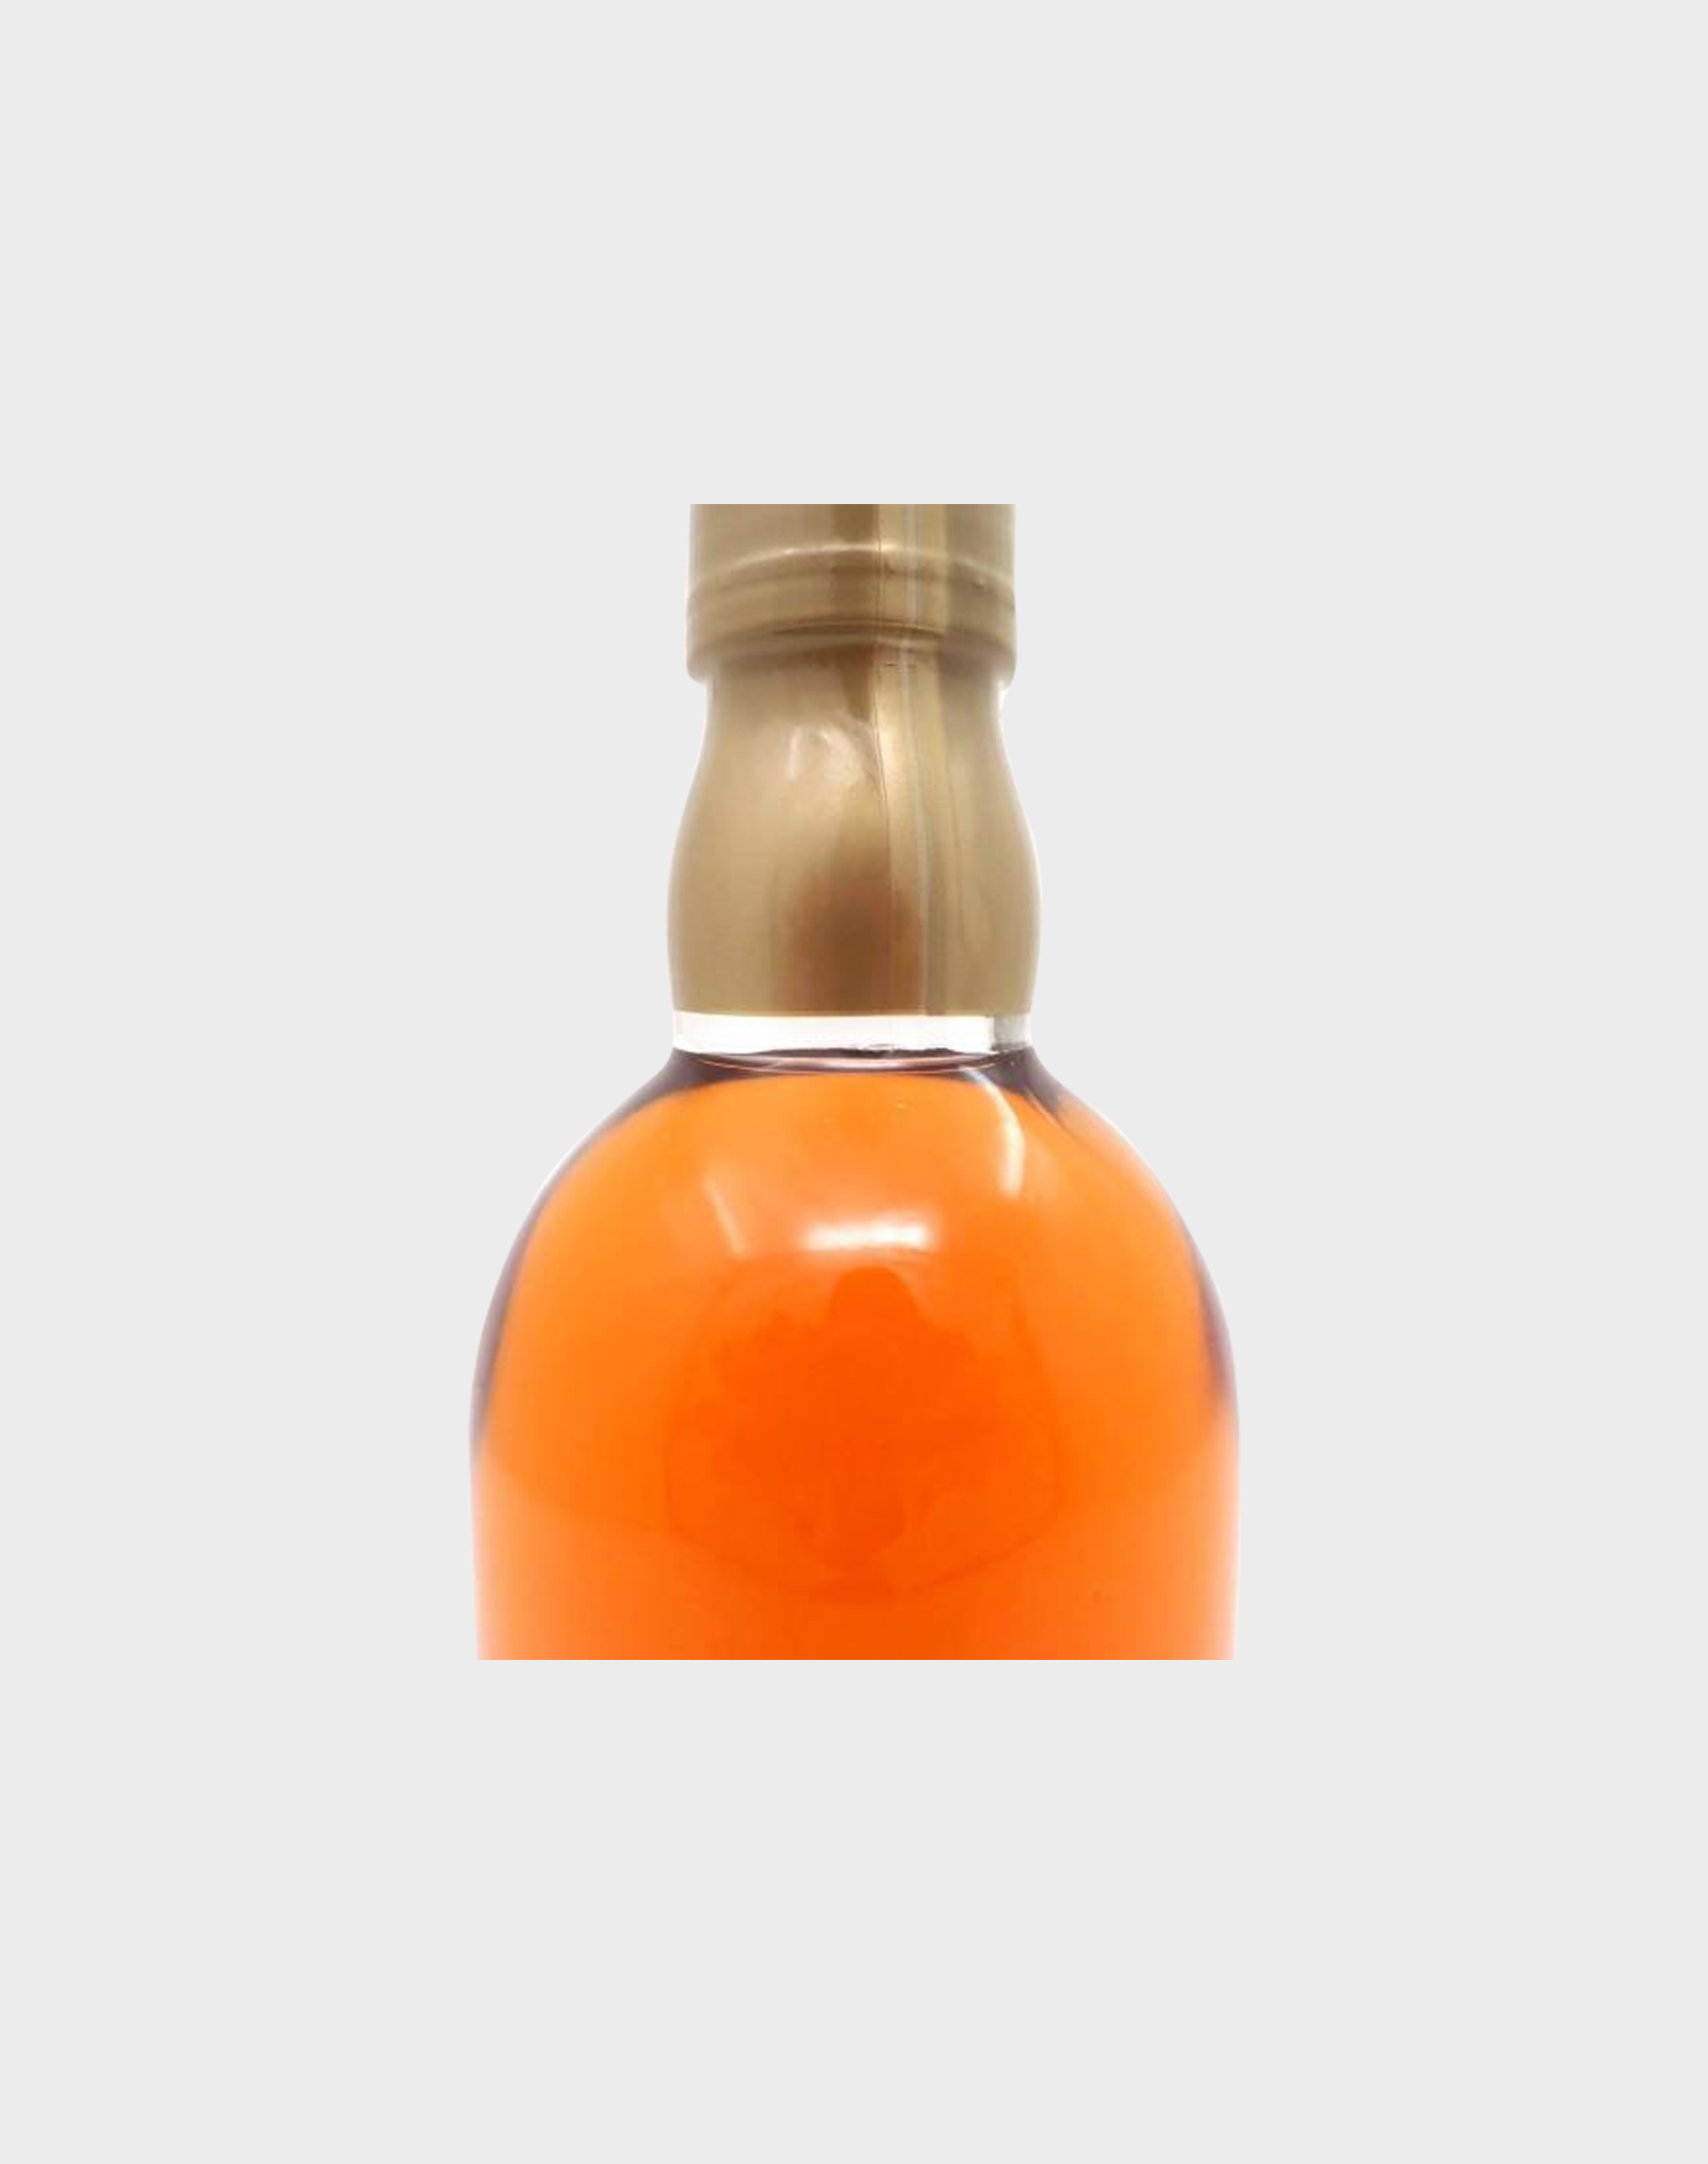 Nikka Yoichi Single Cask 25 Year Old Whisky (5)